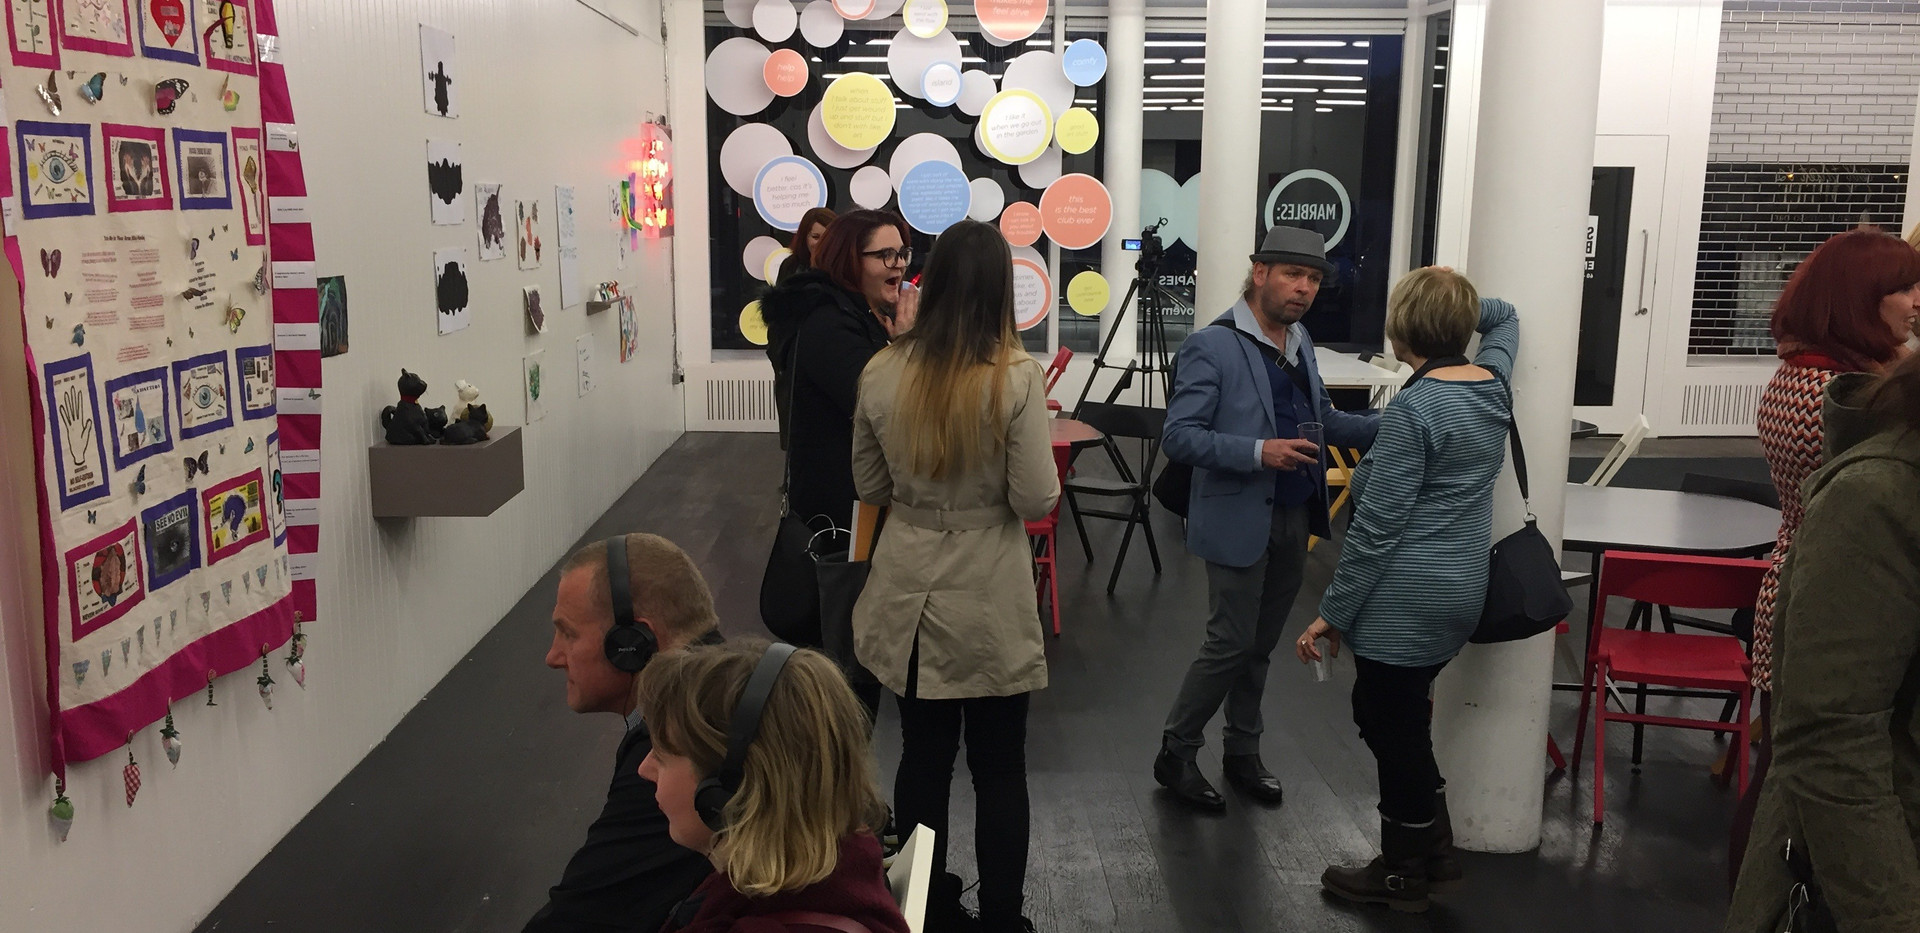 IMG_0323-Exhibtion-crowd.jpg